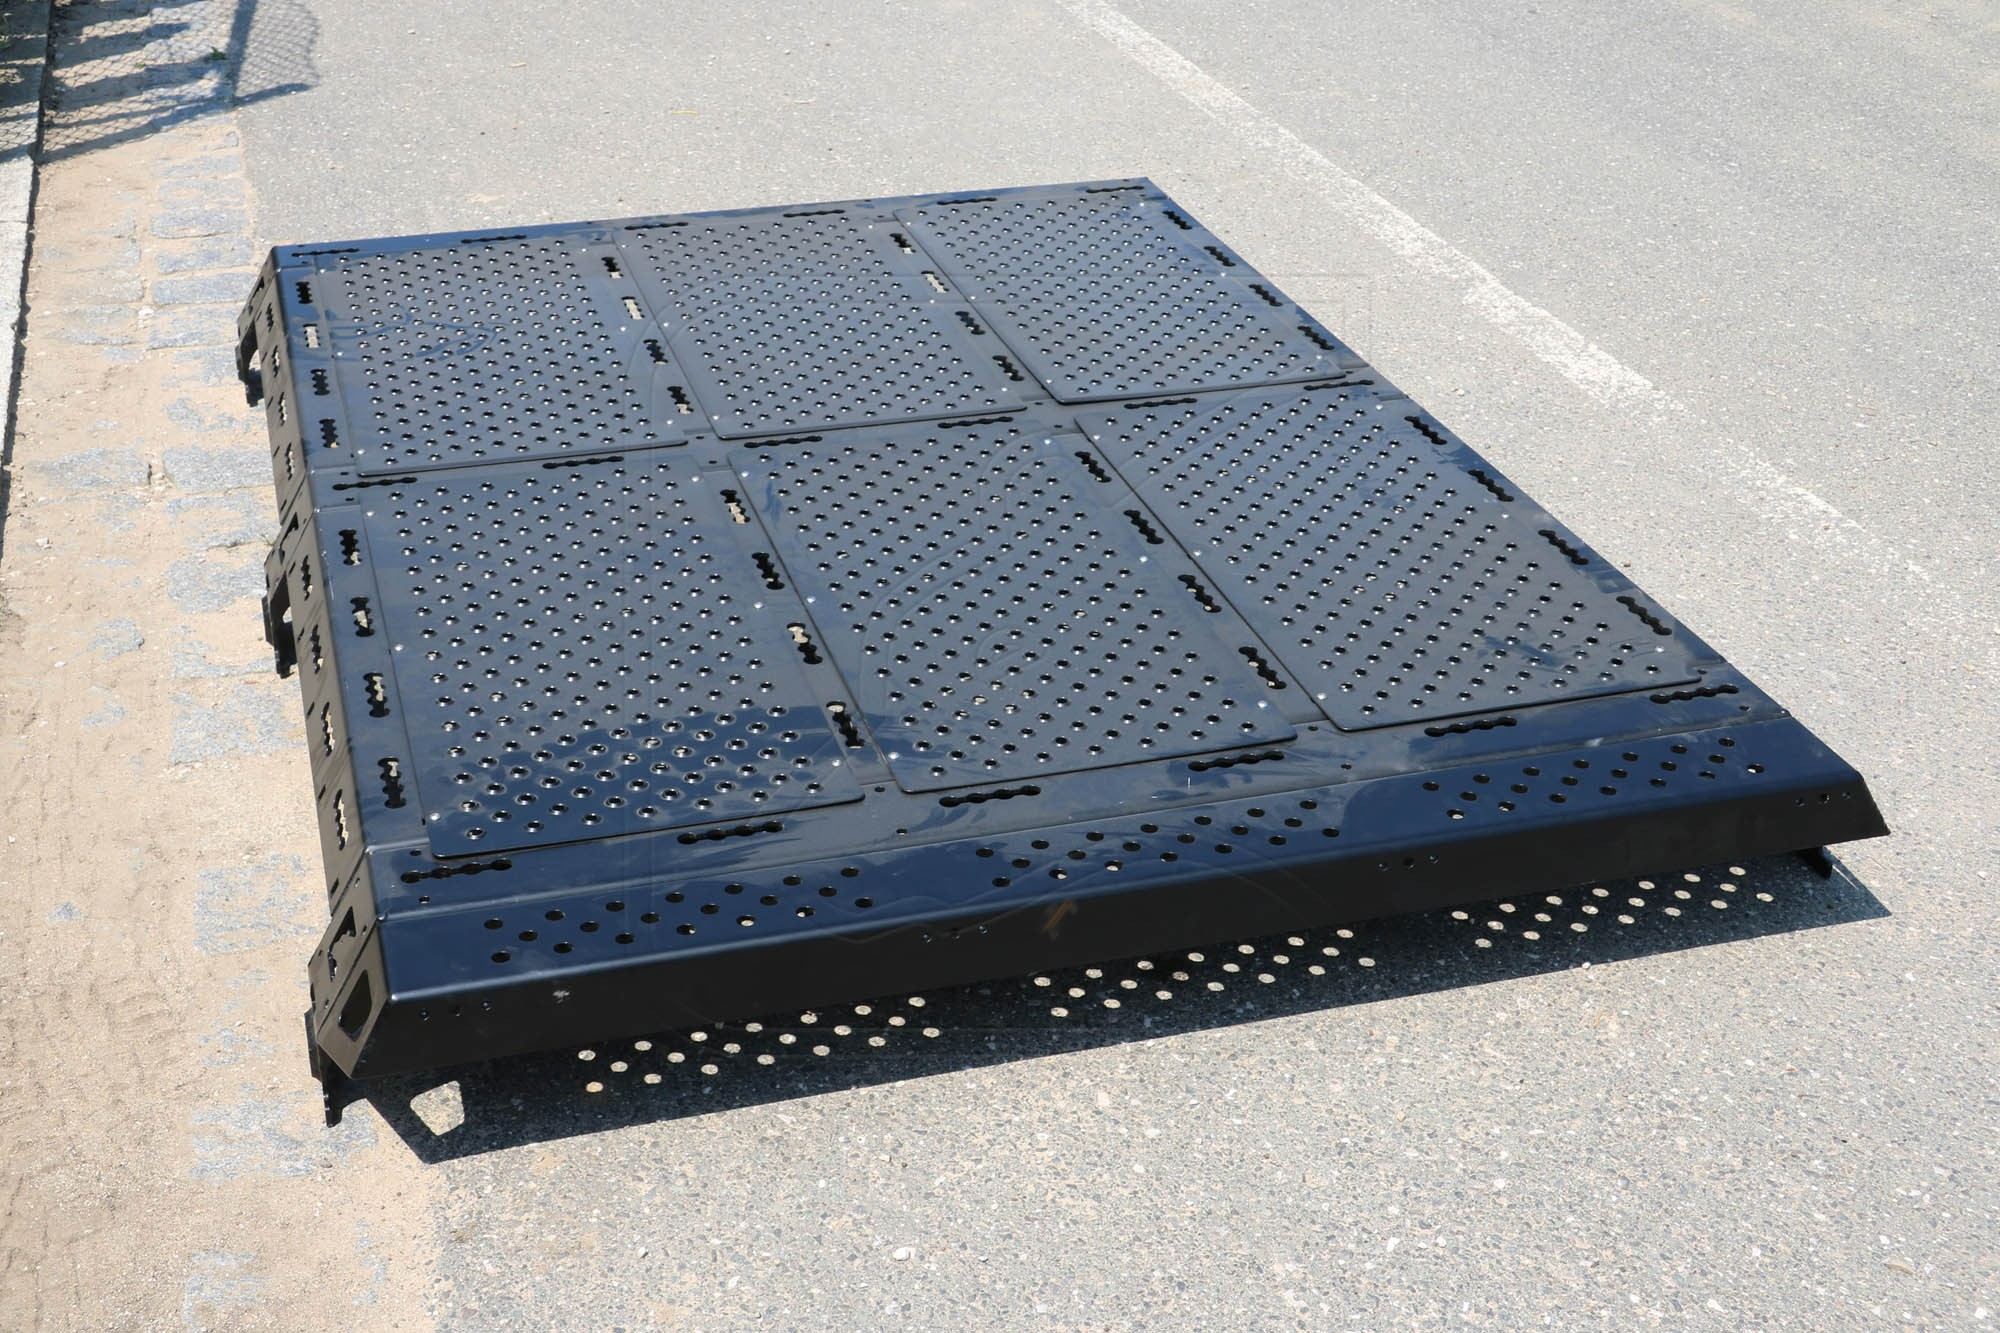 4x4 Outdoor Tuning Cargobear Modular Roof Rack For